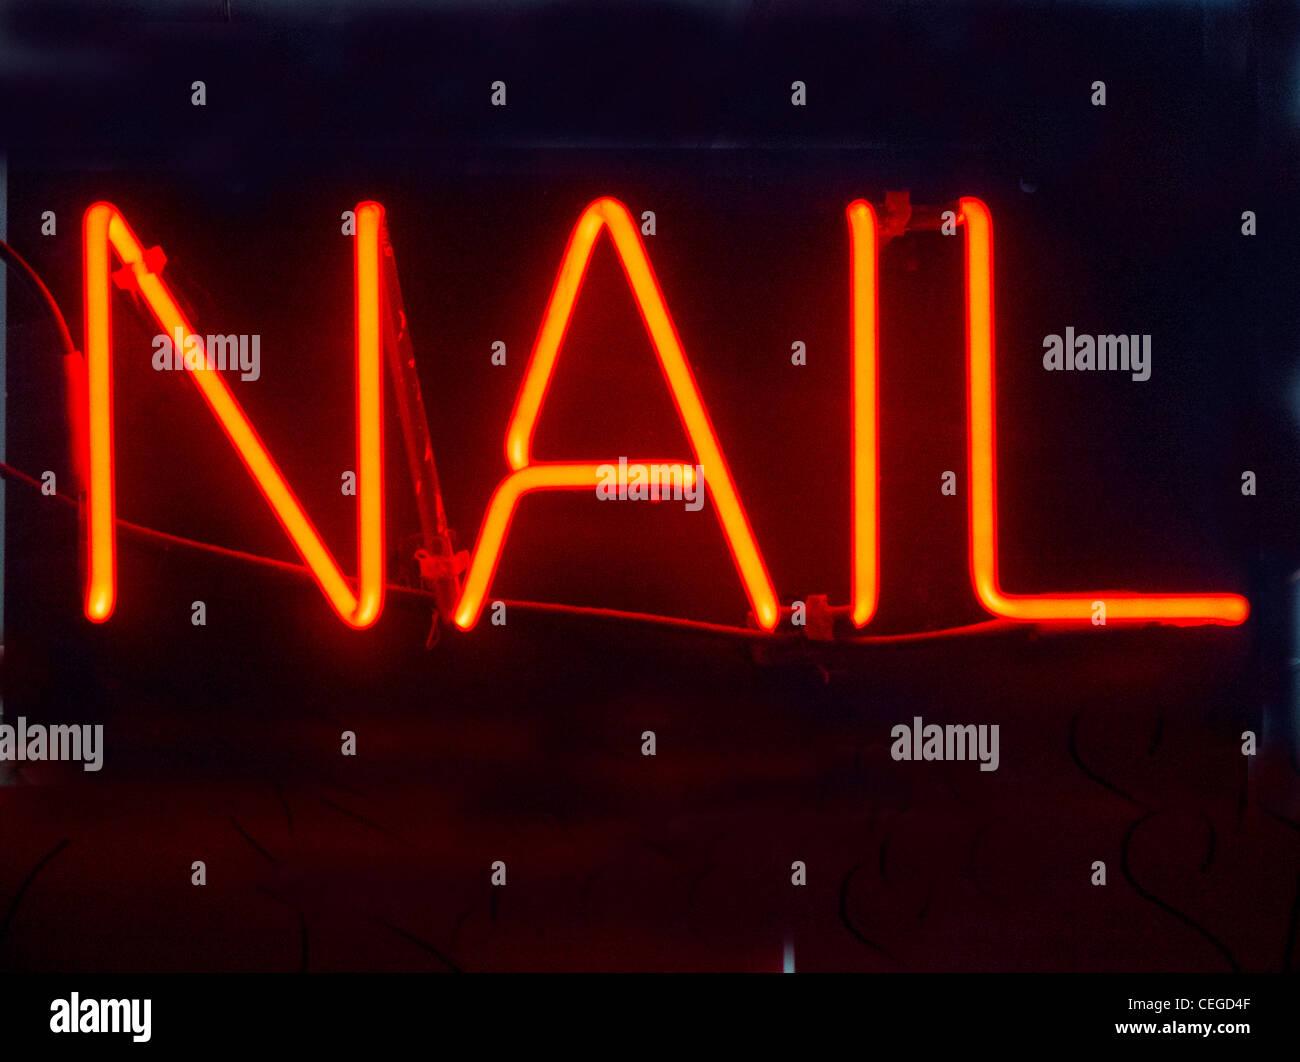 neon nail sign Stock Photo: 43387471 - Alamy